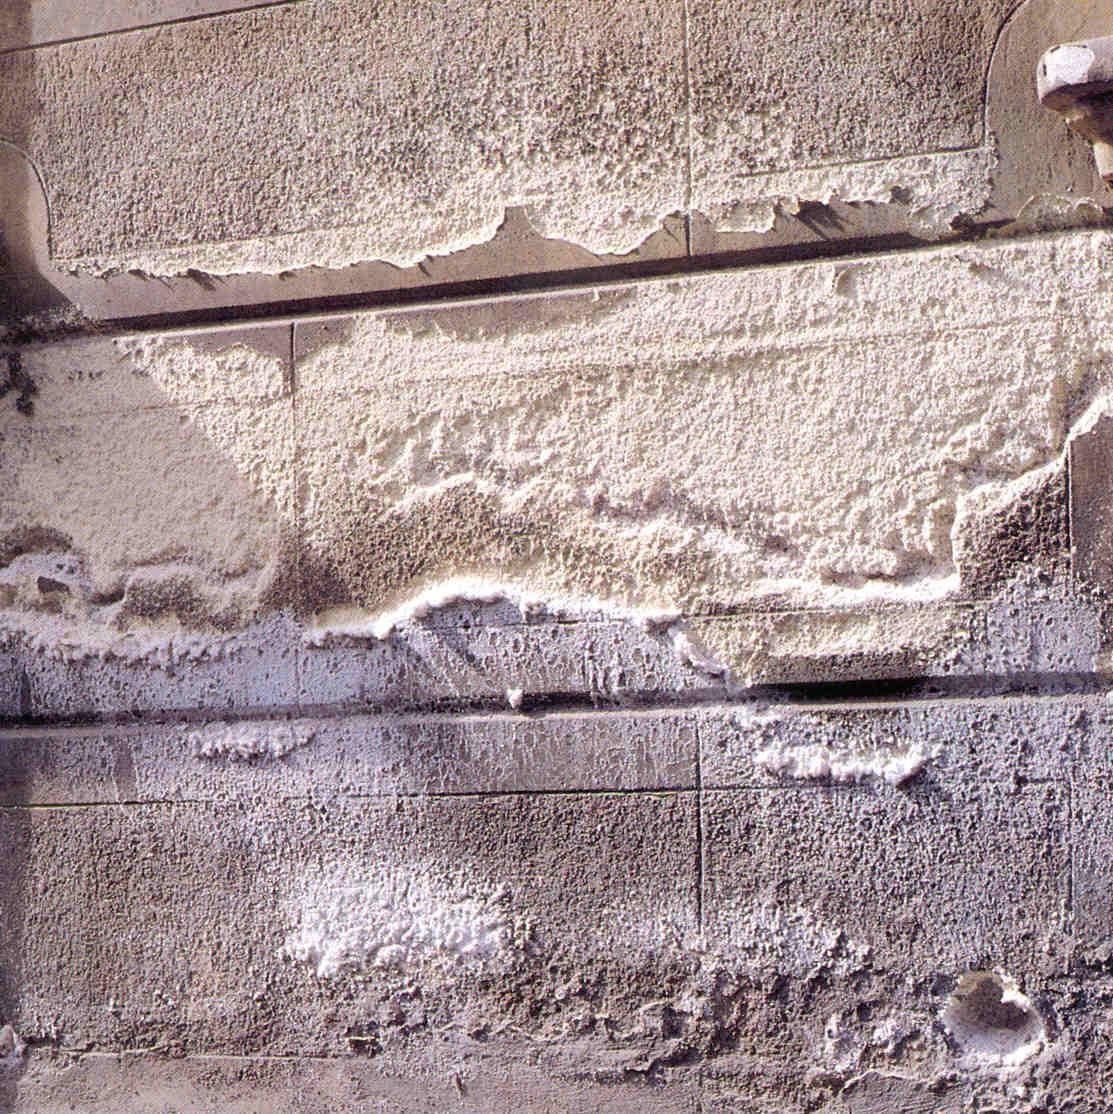 effloresence-in-exterior-walls1569428460.jpg